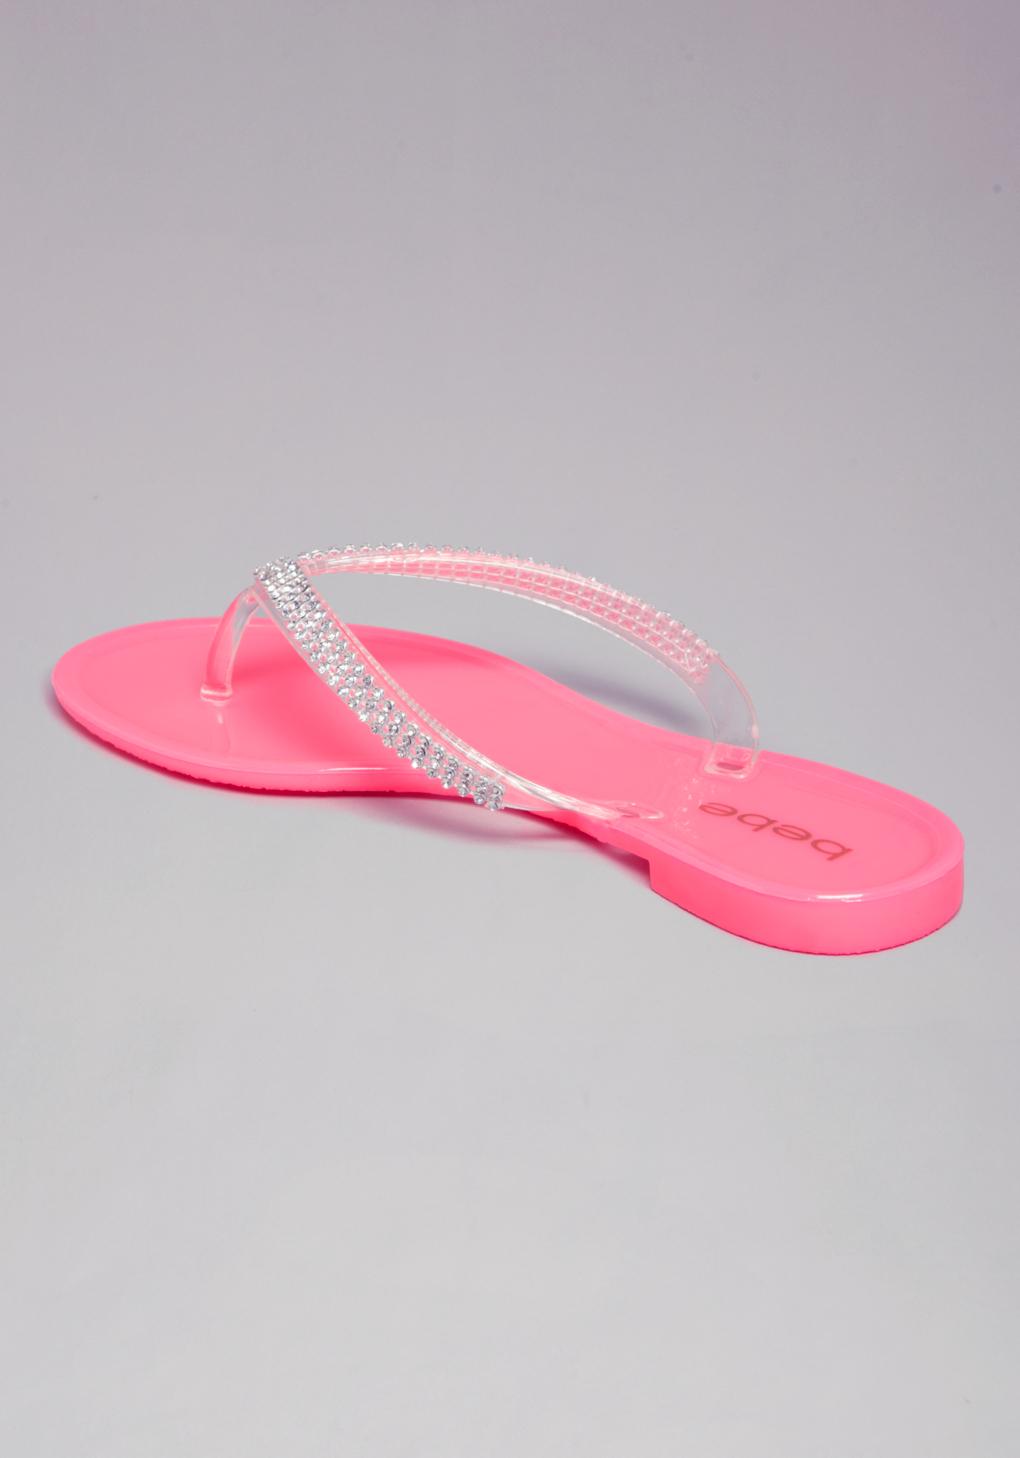 Bebe Audriella Jelly Flip Flops In Pink - Lyst-9353